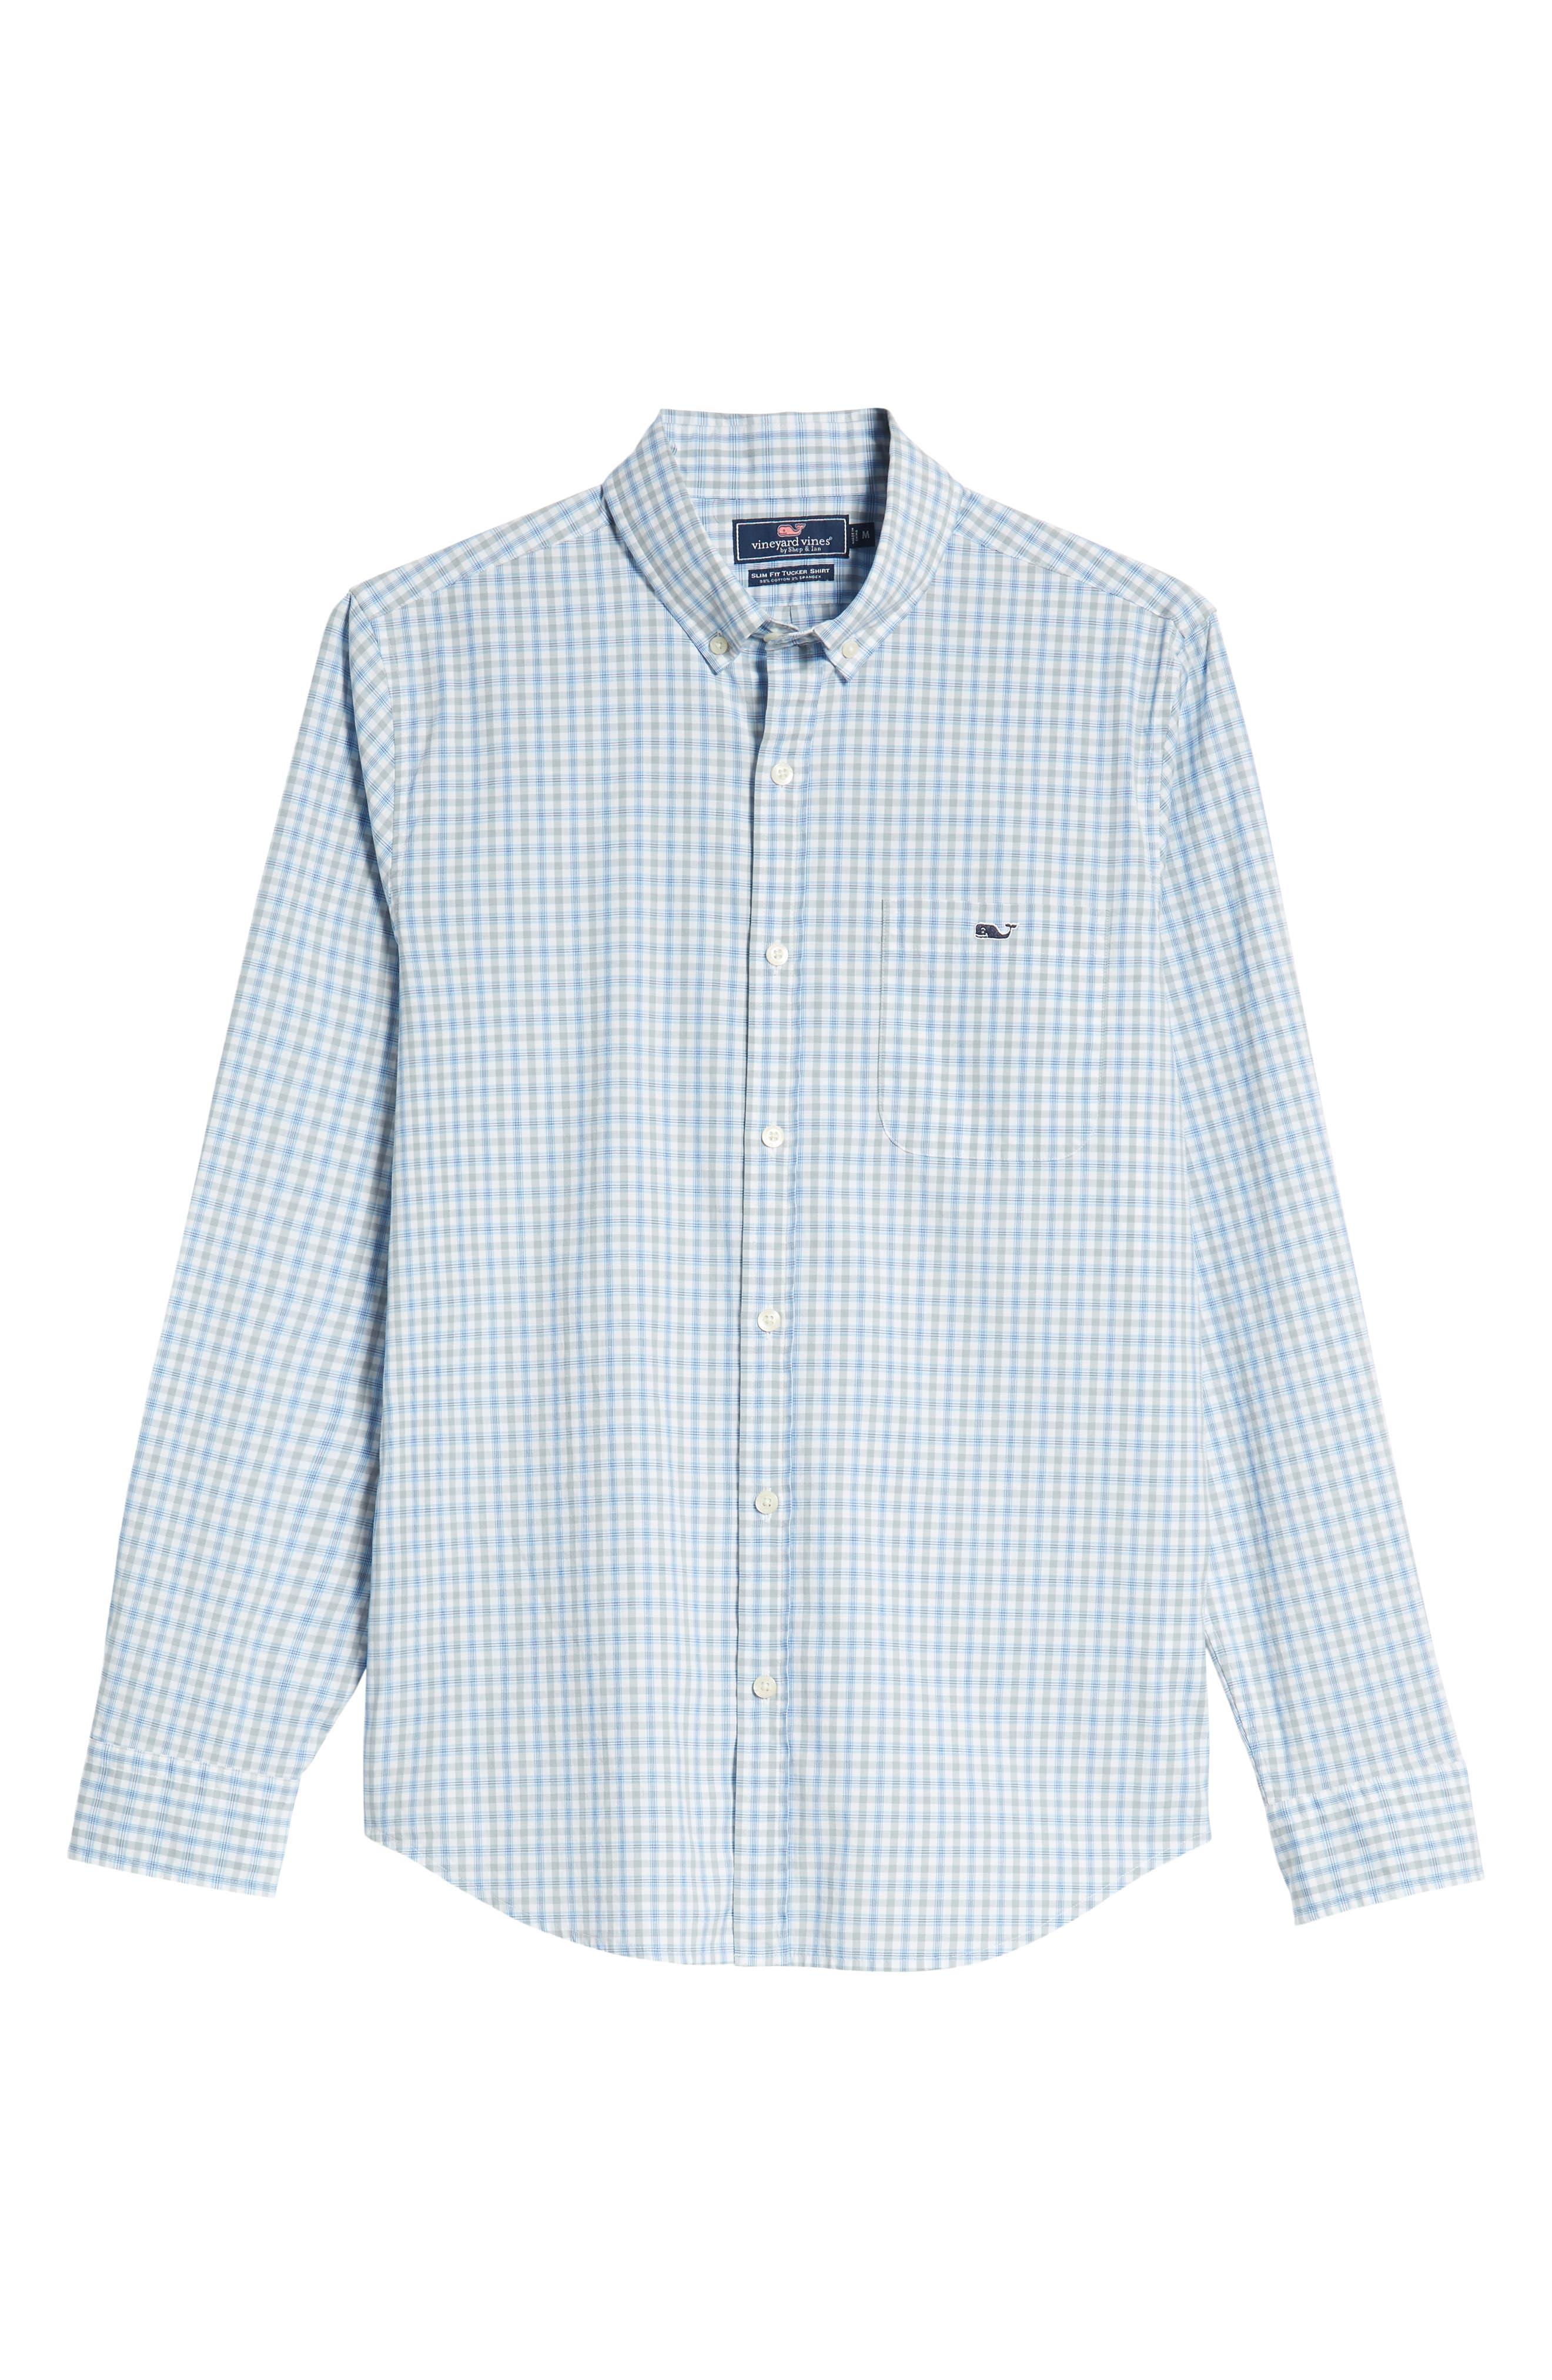 VINEYARD VINES,                             Murray Slim Fit Sport Shirt,                             Alternate thumbnail 5, color,                             034